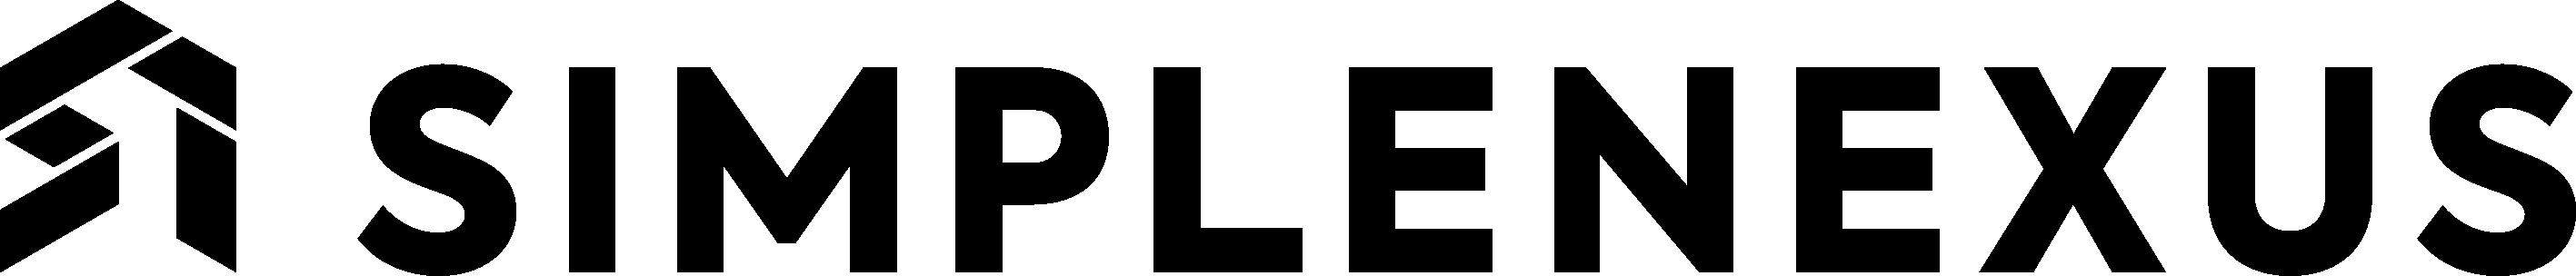 SimpleNexus_Logo_Black